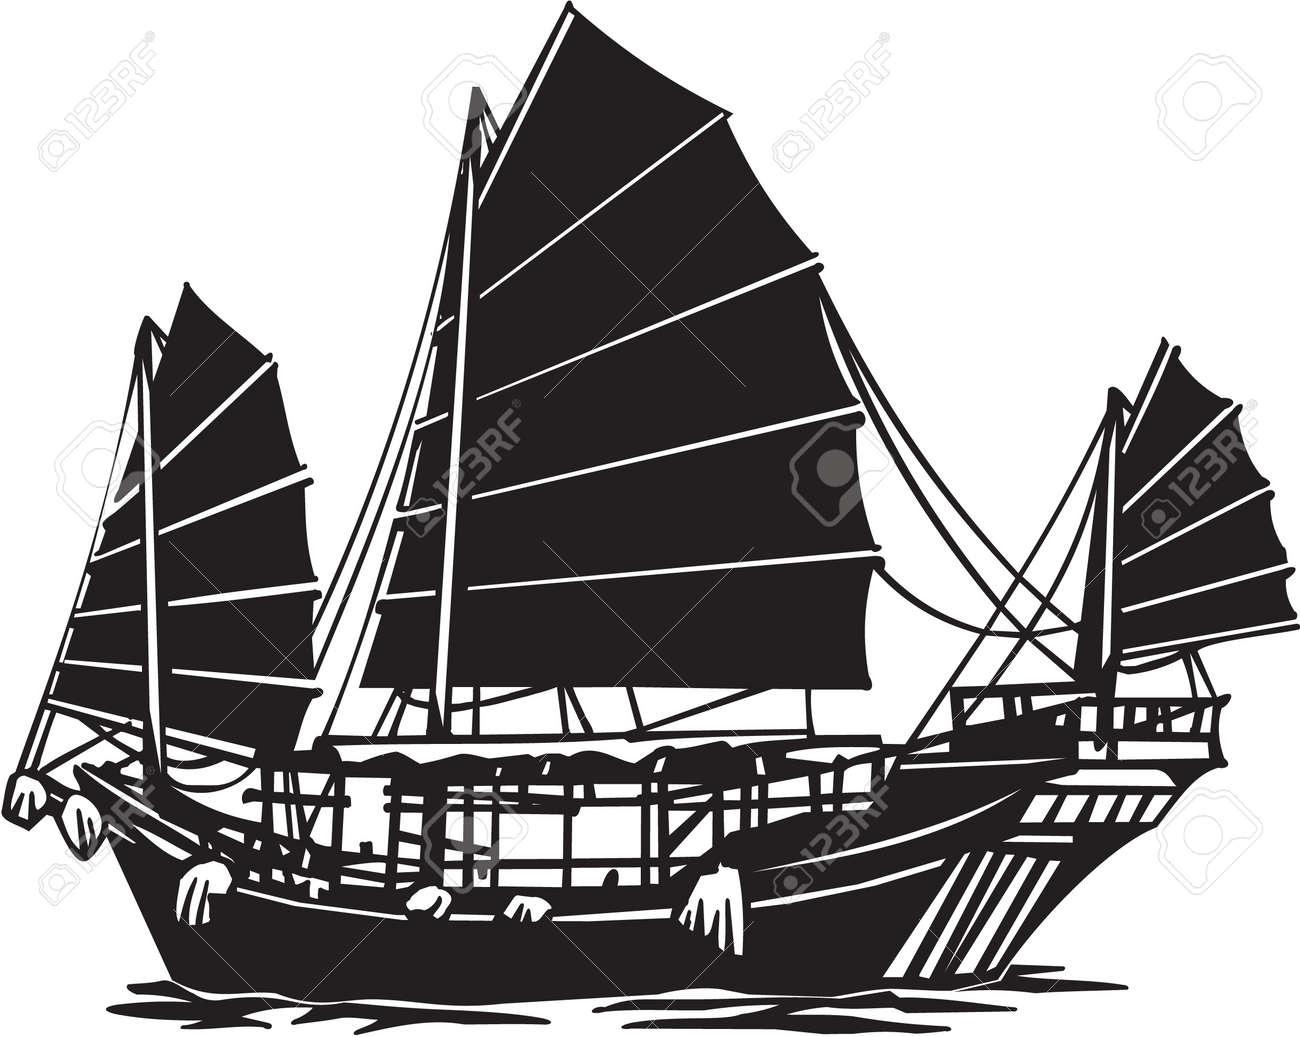 Chinese Junk Vinyl Ready Illustration Stock Vector - 14353847